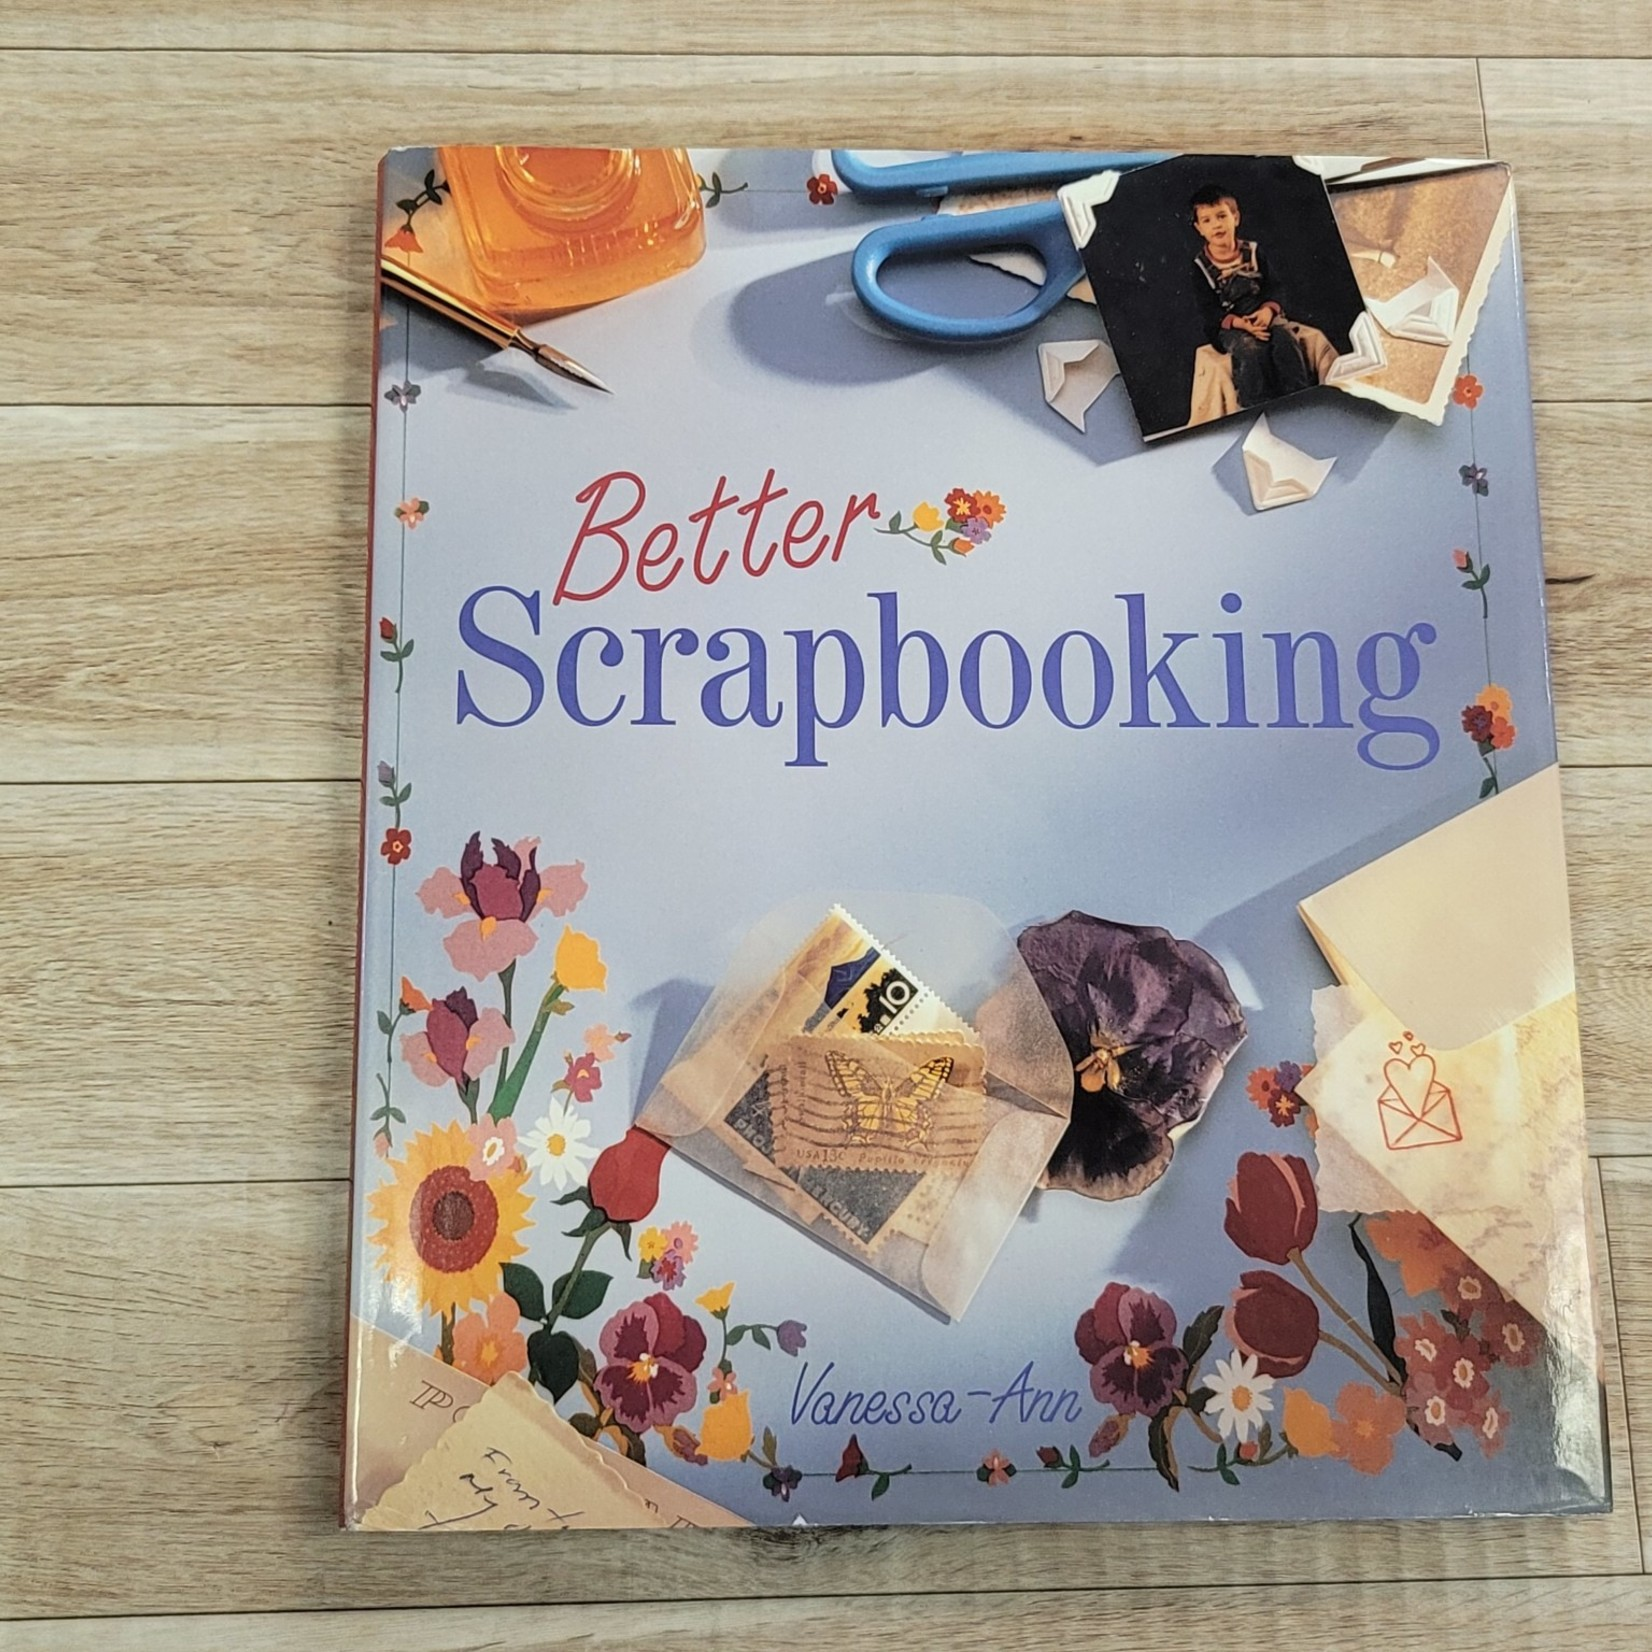 Scrapbooking Books - Better Scrapbooking